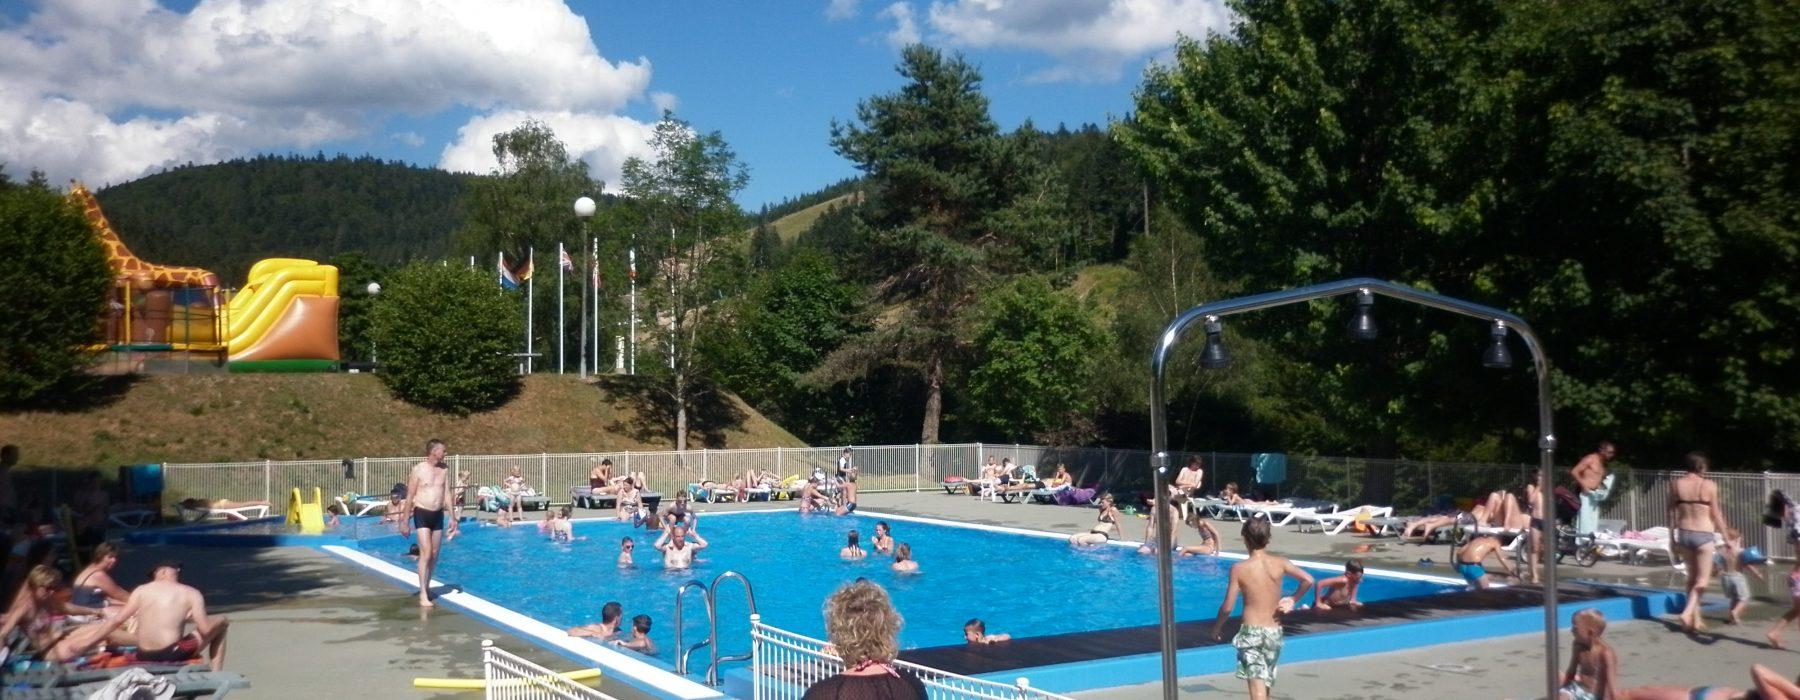 Swimming Pool Area | Camping Belle Hutte destiné Camping Gérardmer Avec Piscine